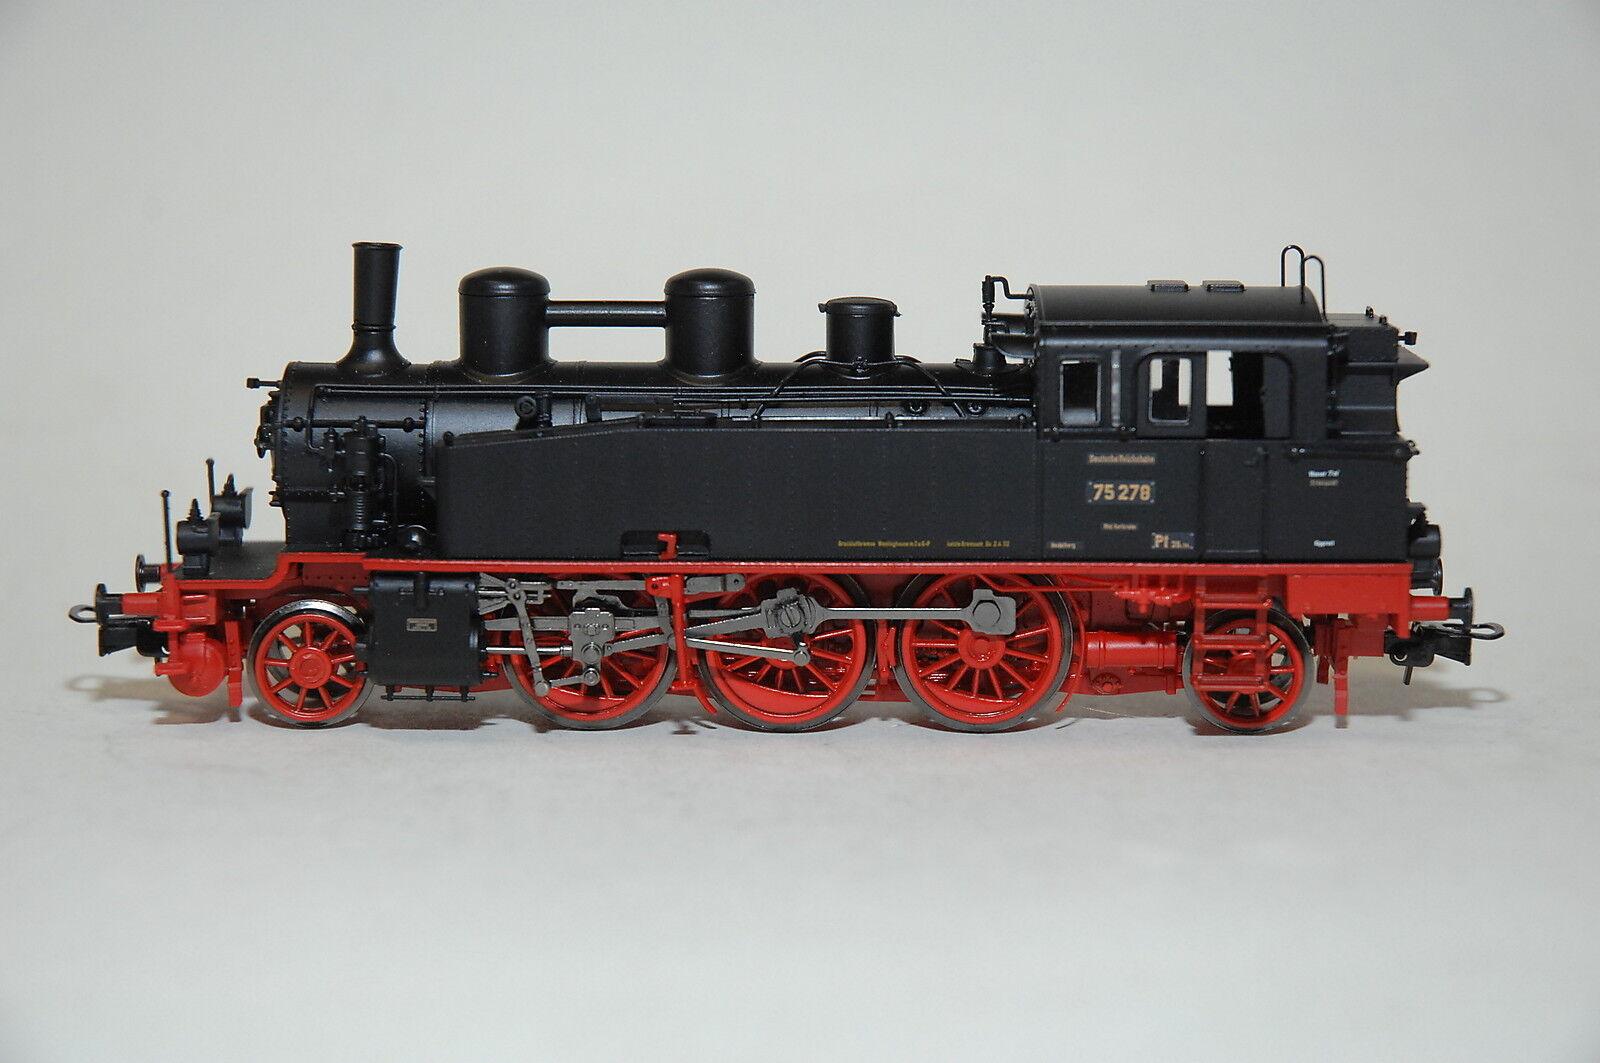 Liliput 131191 dampflokomotive br 75 278 ex bad.vib drg ep.ii neue